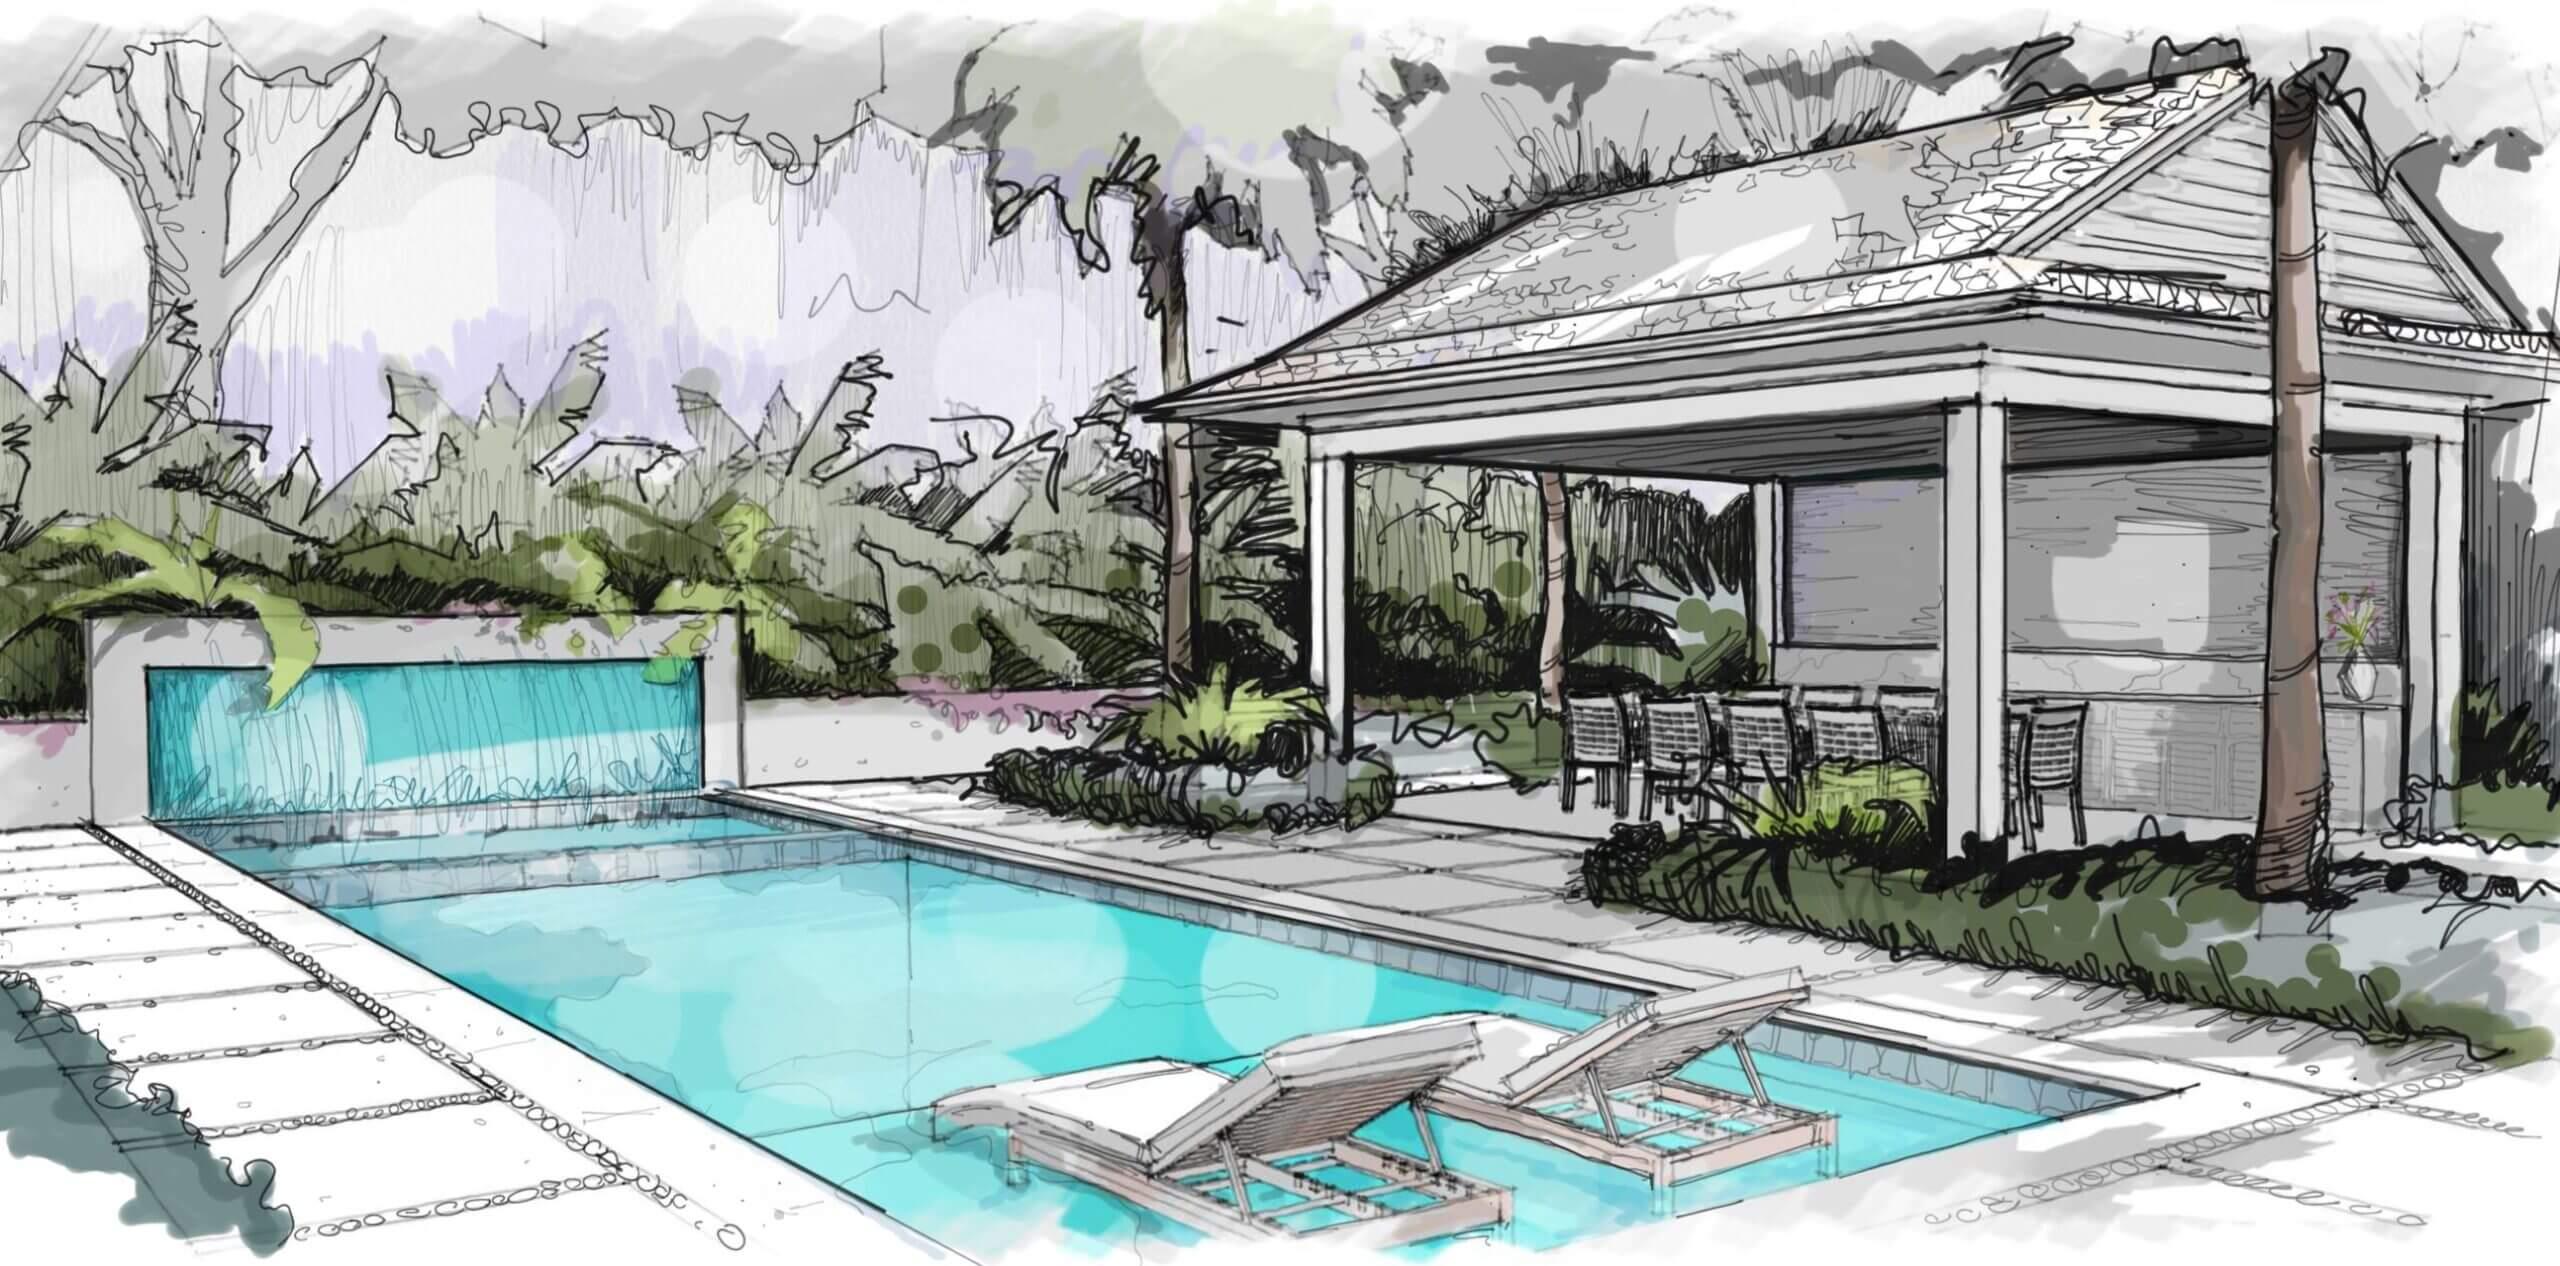 Pool & Landscape Process Sketch Vero Beach